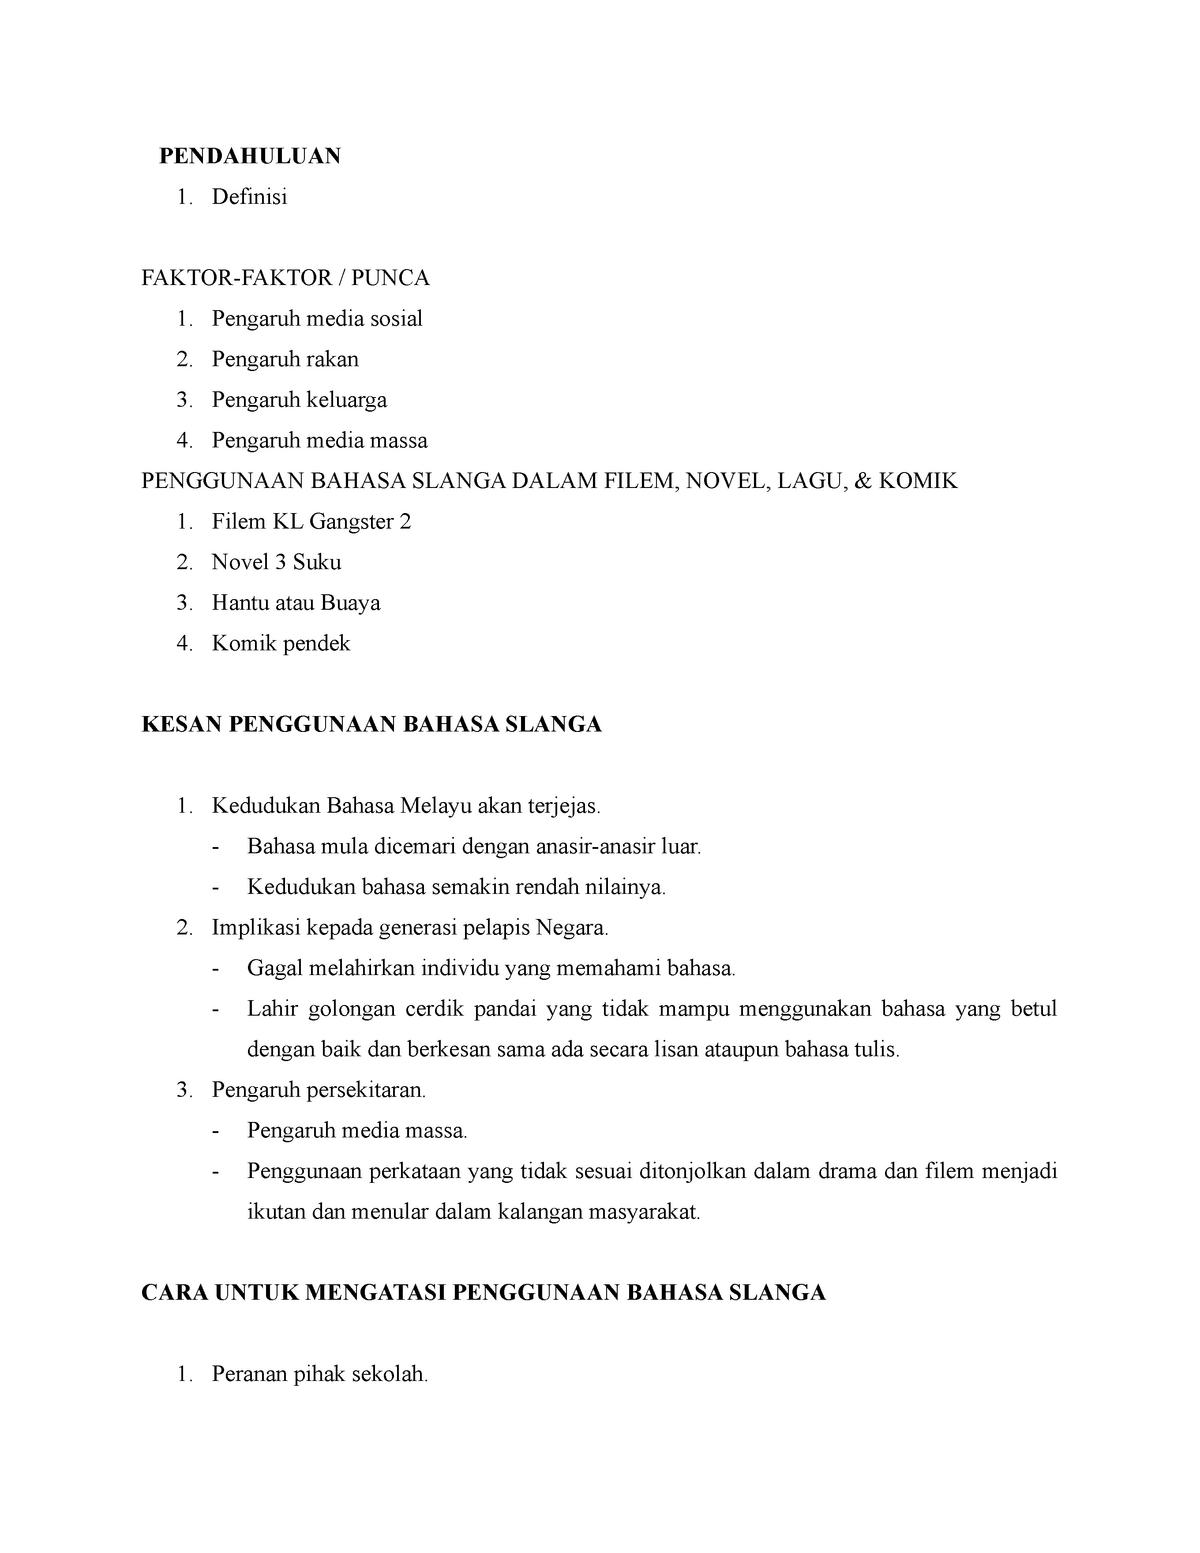 Kesan Penggunaan Bahasa Slanga Sblm1053 Uum Studocu